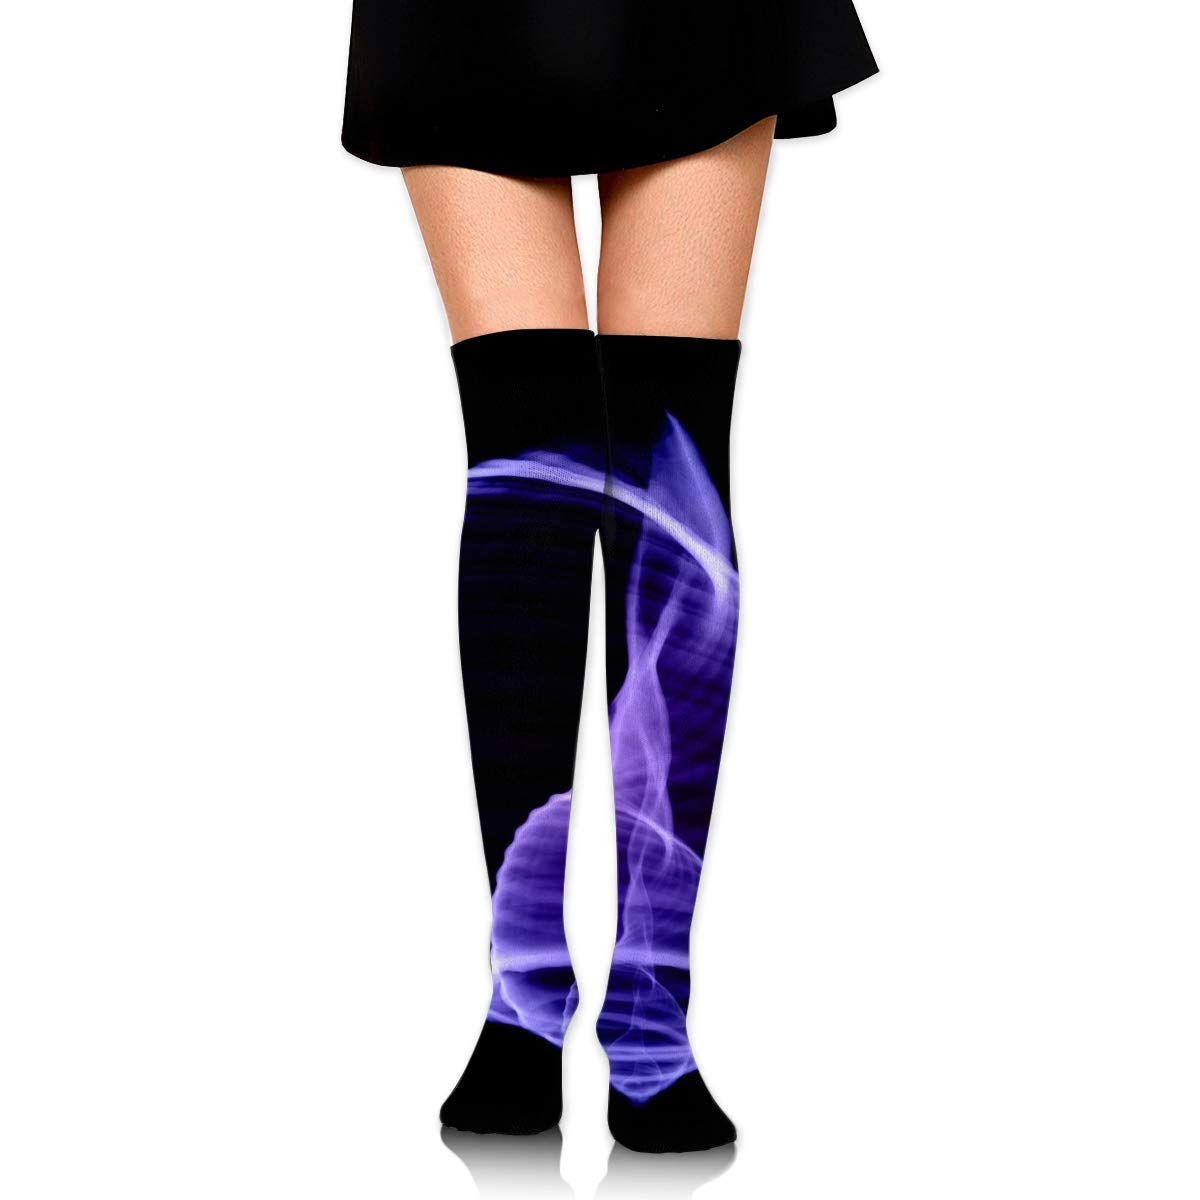 High Elasticity Girl Cotton Knee High Socks Uniform Purple Line Shell Women Tube Socks